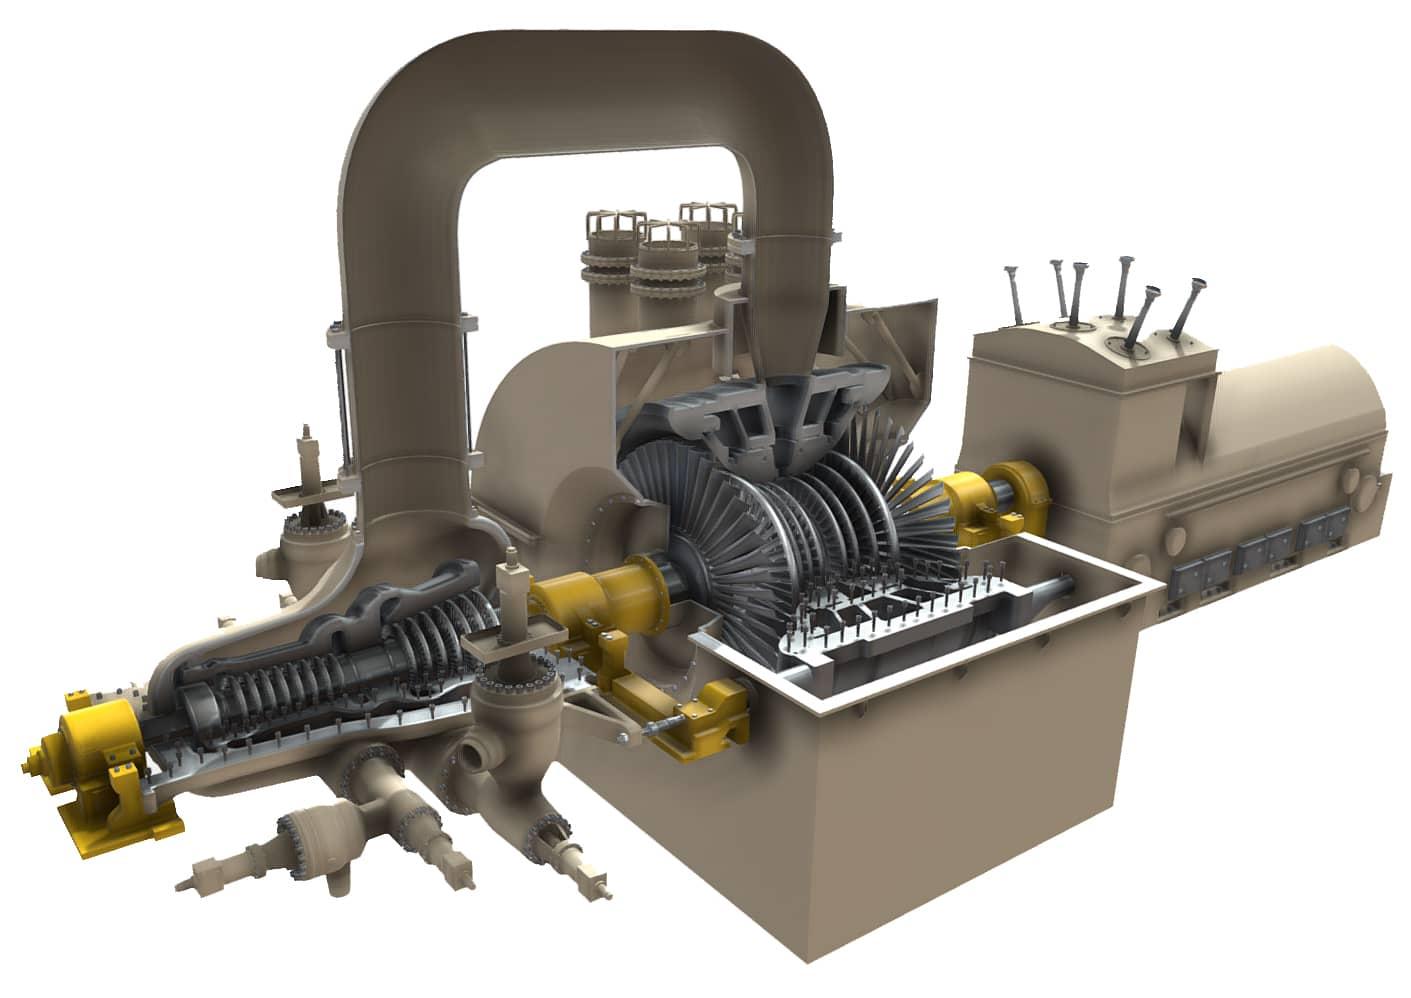 Steam Turbine Siemens SST-5000 Explained - saVRee